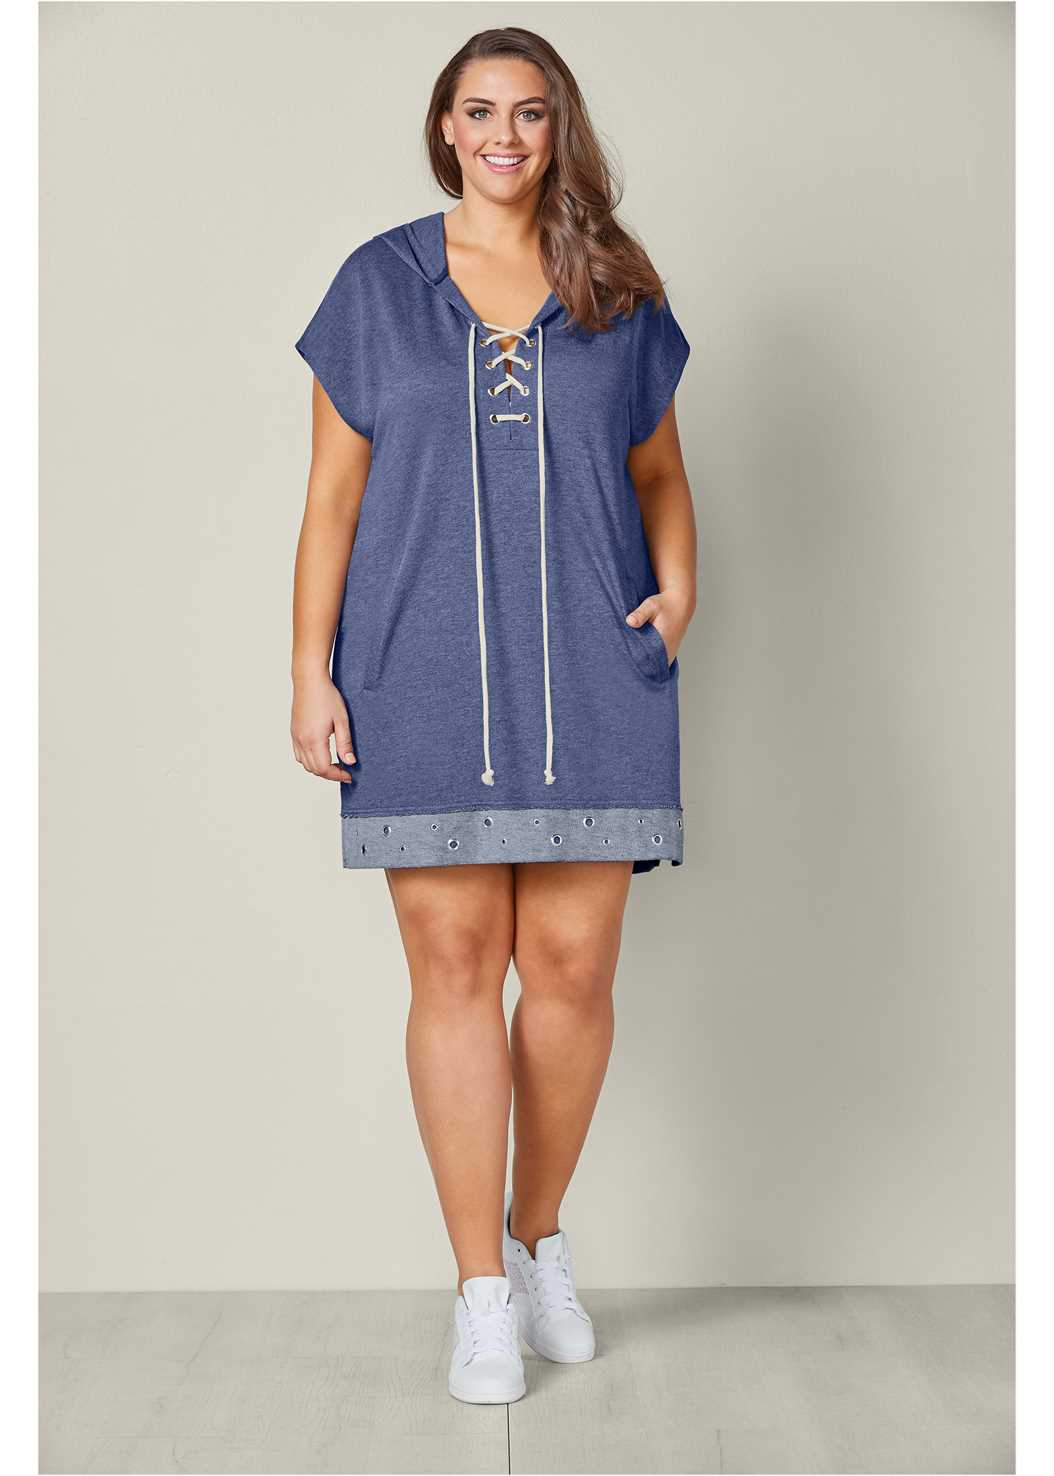 Grommet Detail Lounge Dress